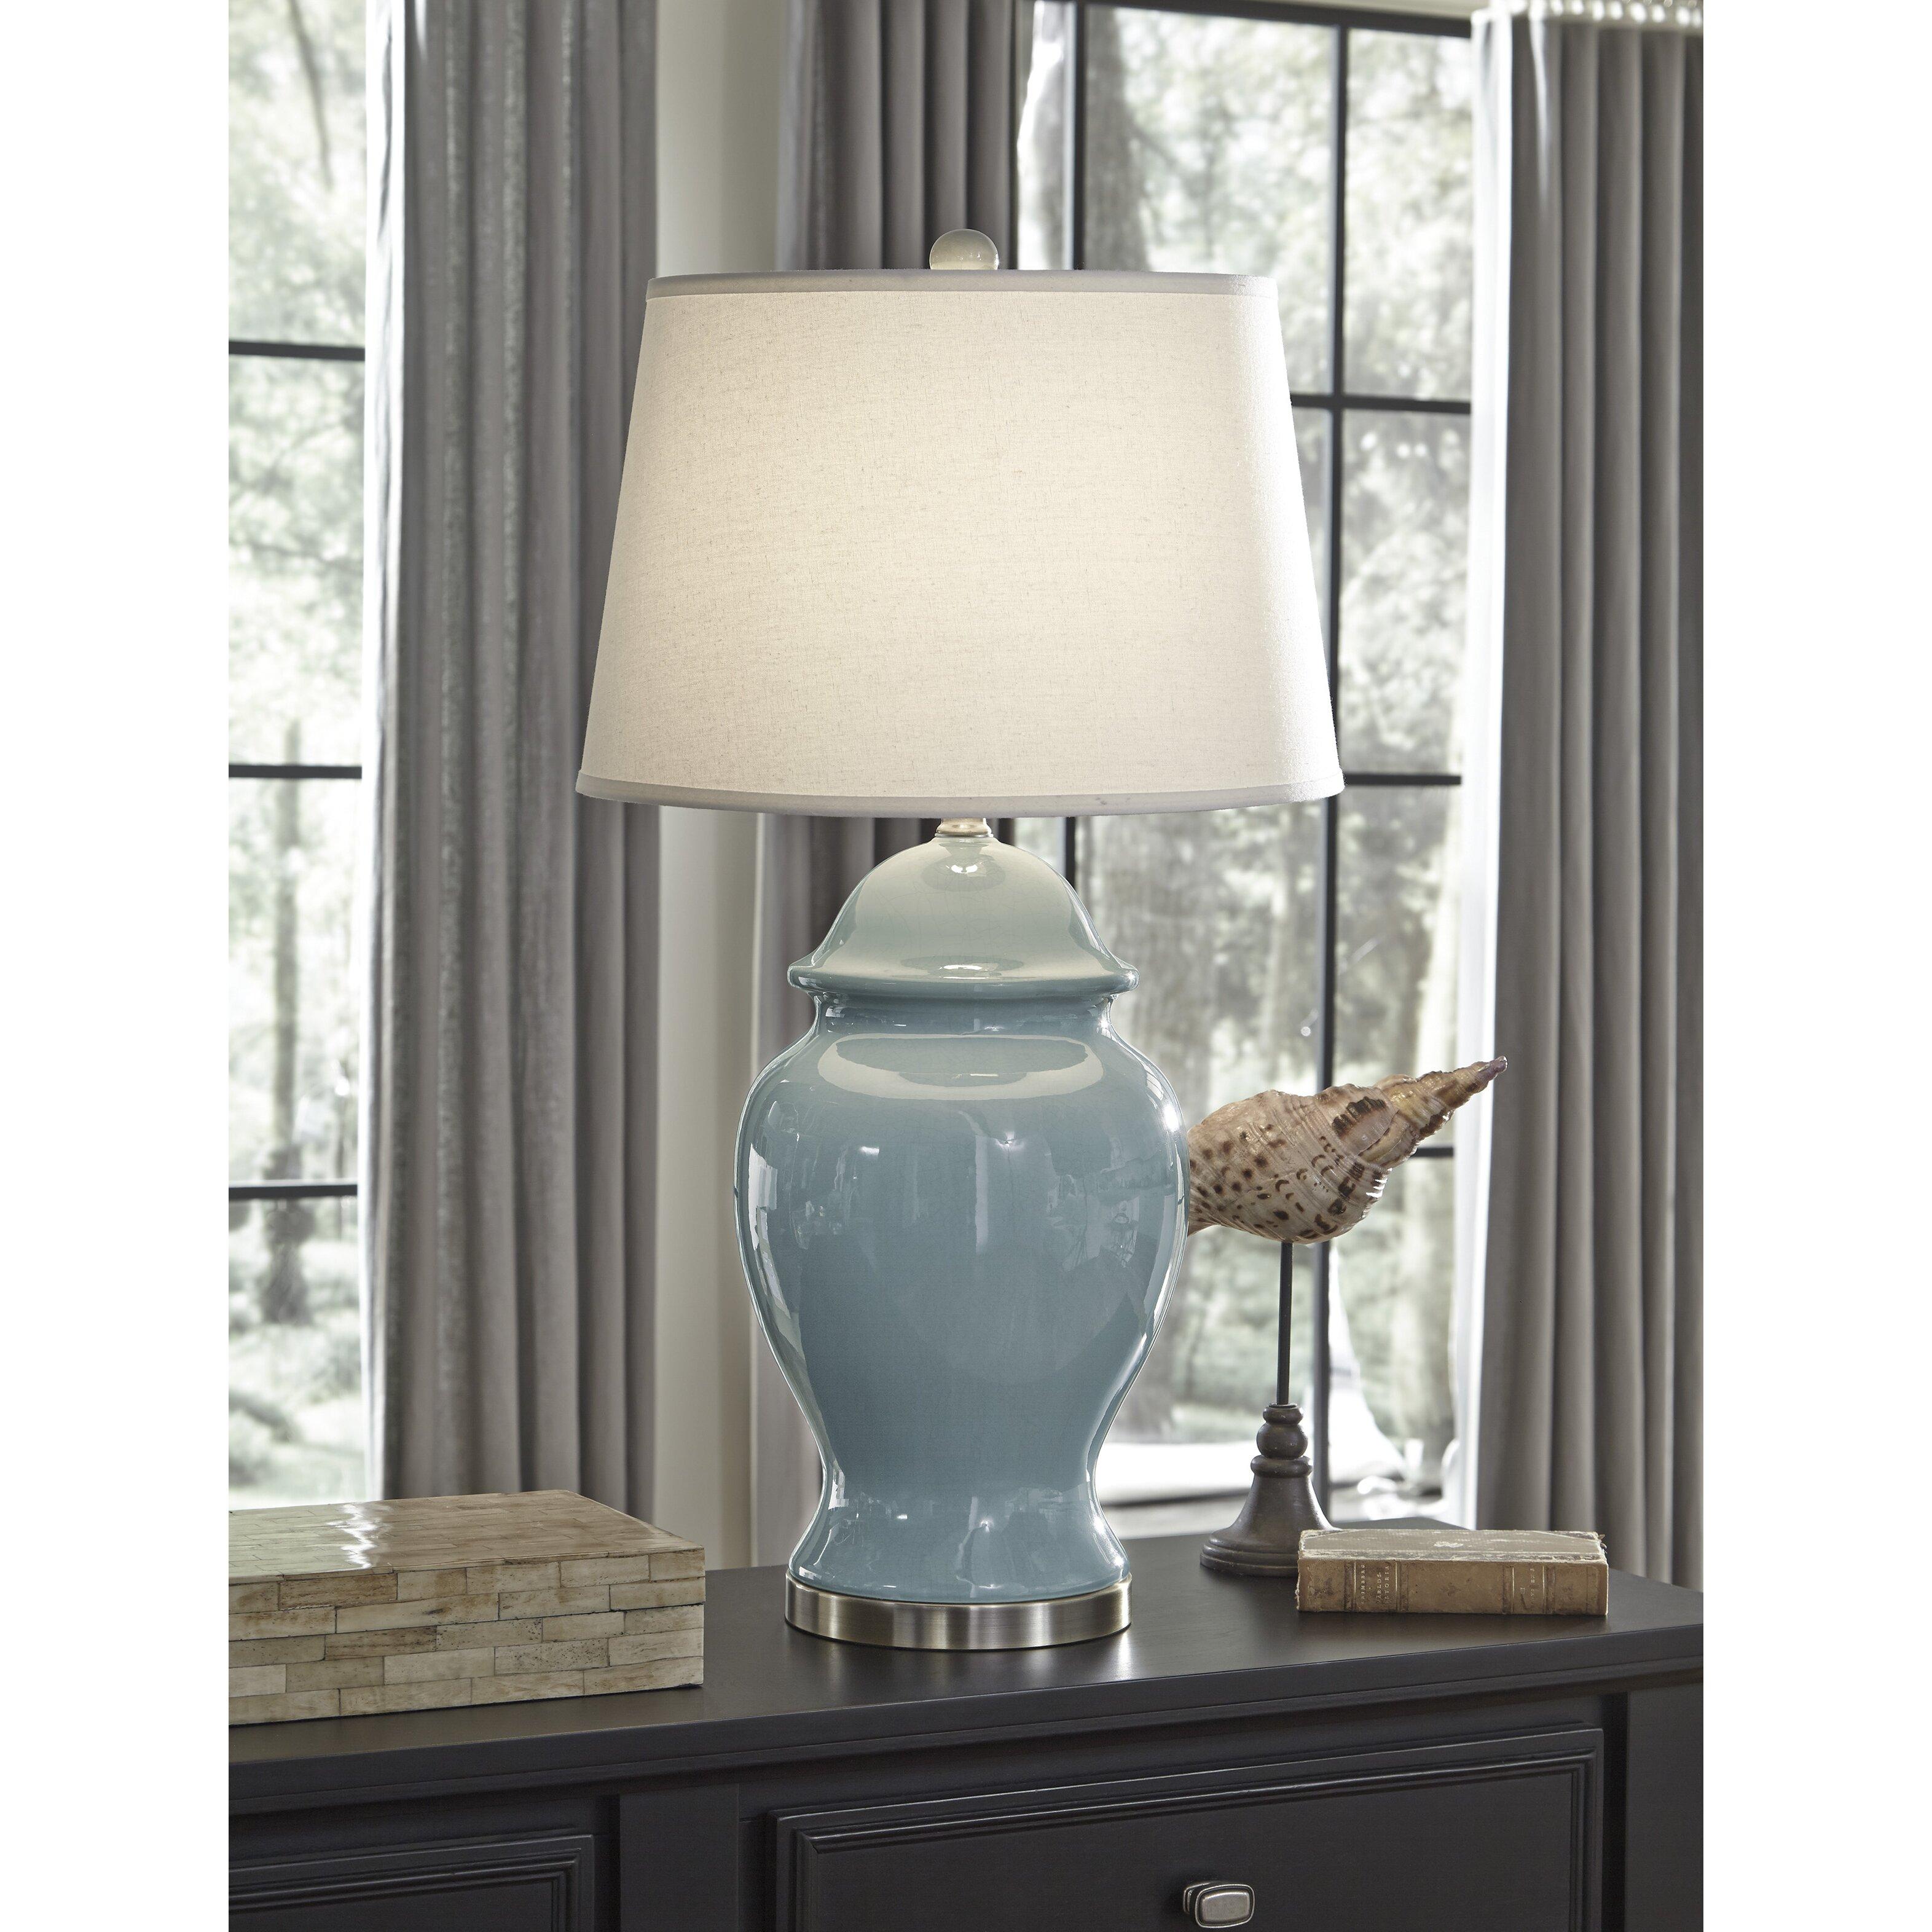 "Beachcrest Home Gotha 3 Light Vanity Light Reviews: Beachcrest Home Greeley 31.75"" Table Lamp & Reviews"